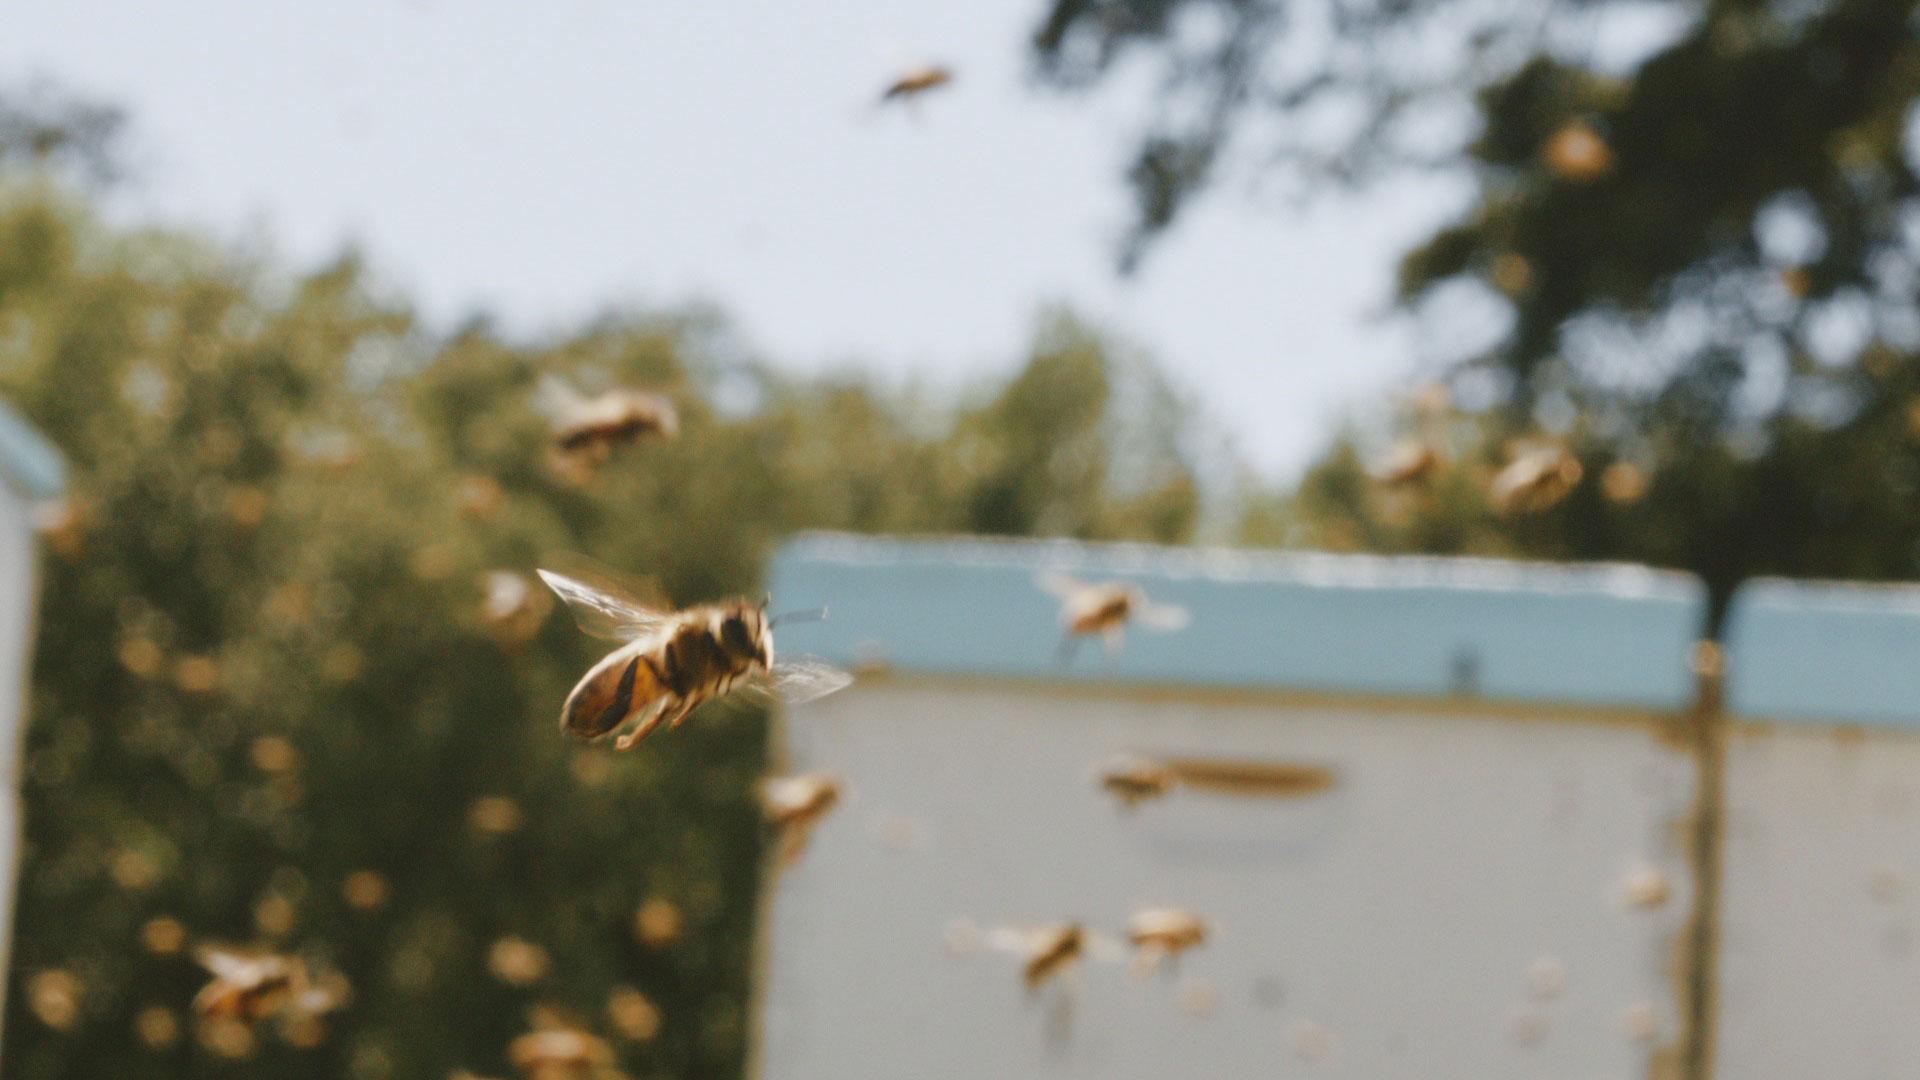 upmc beekeeper 2